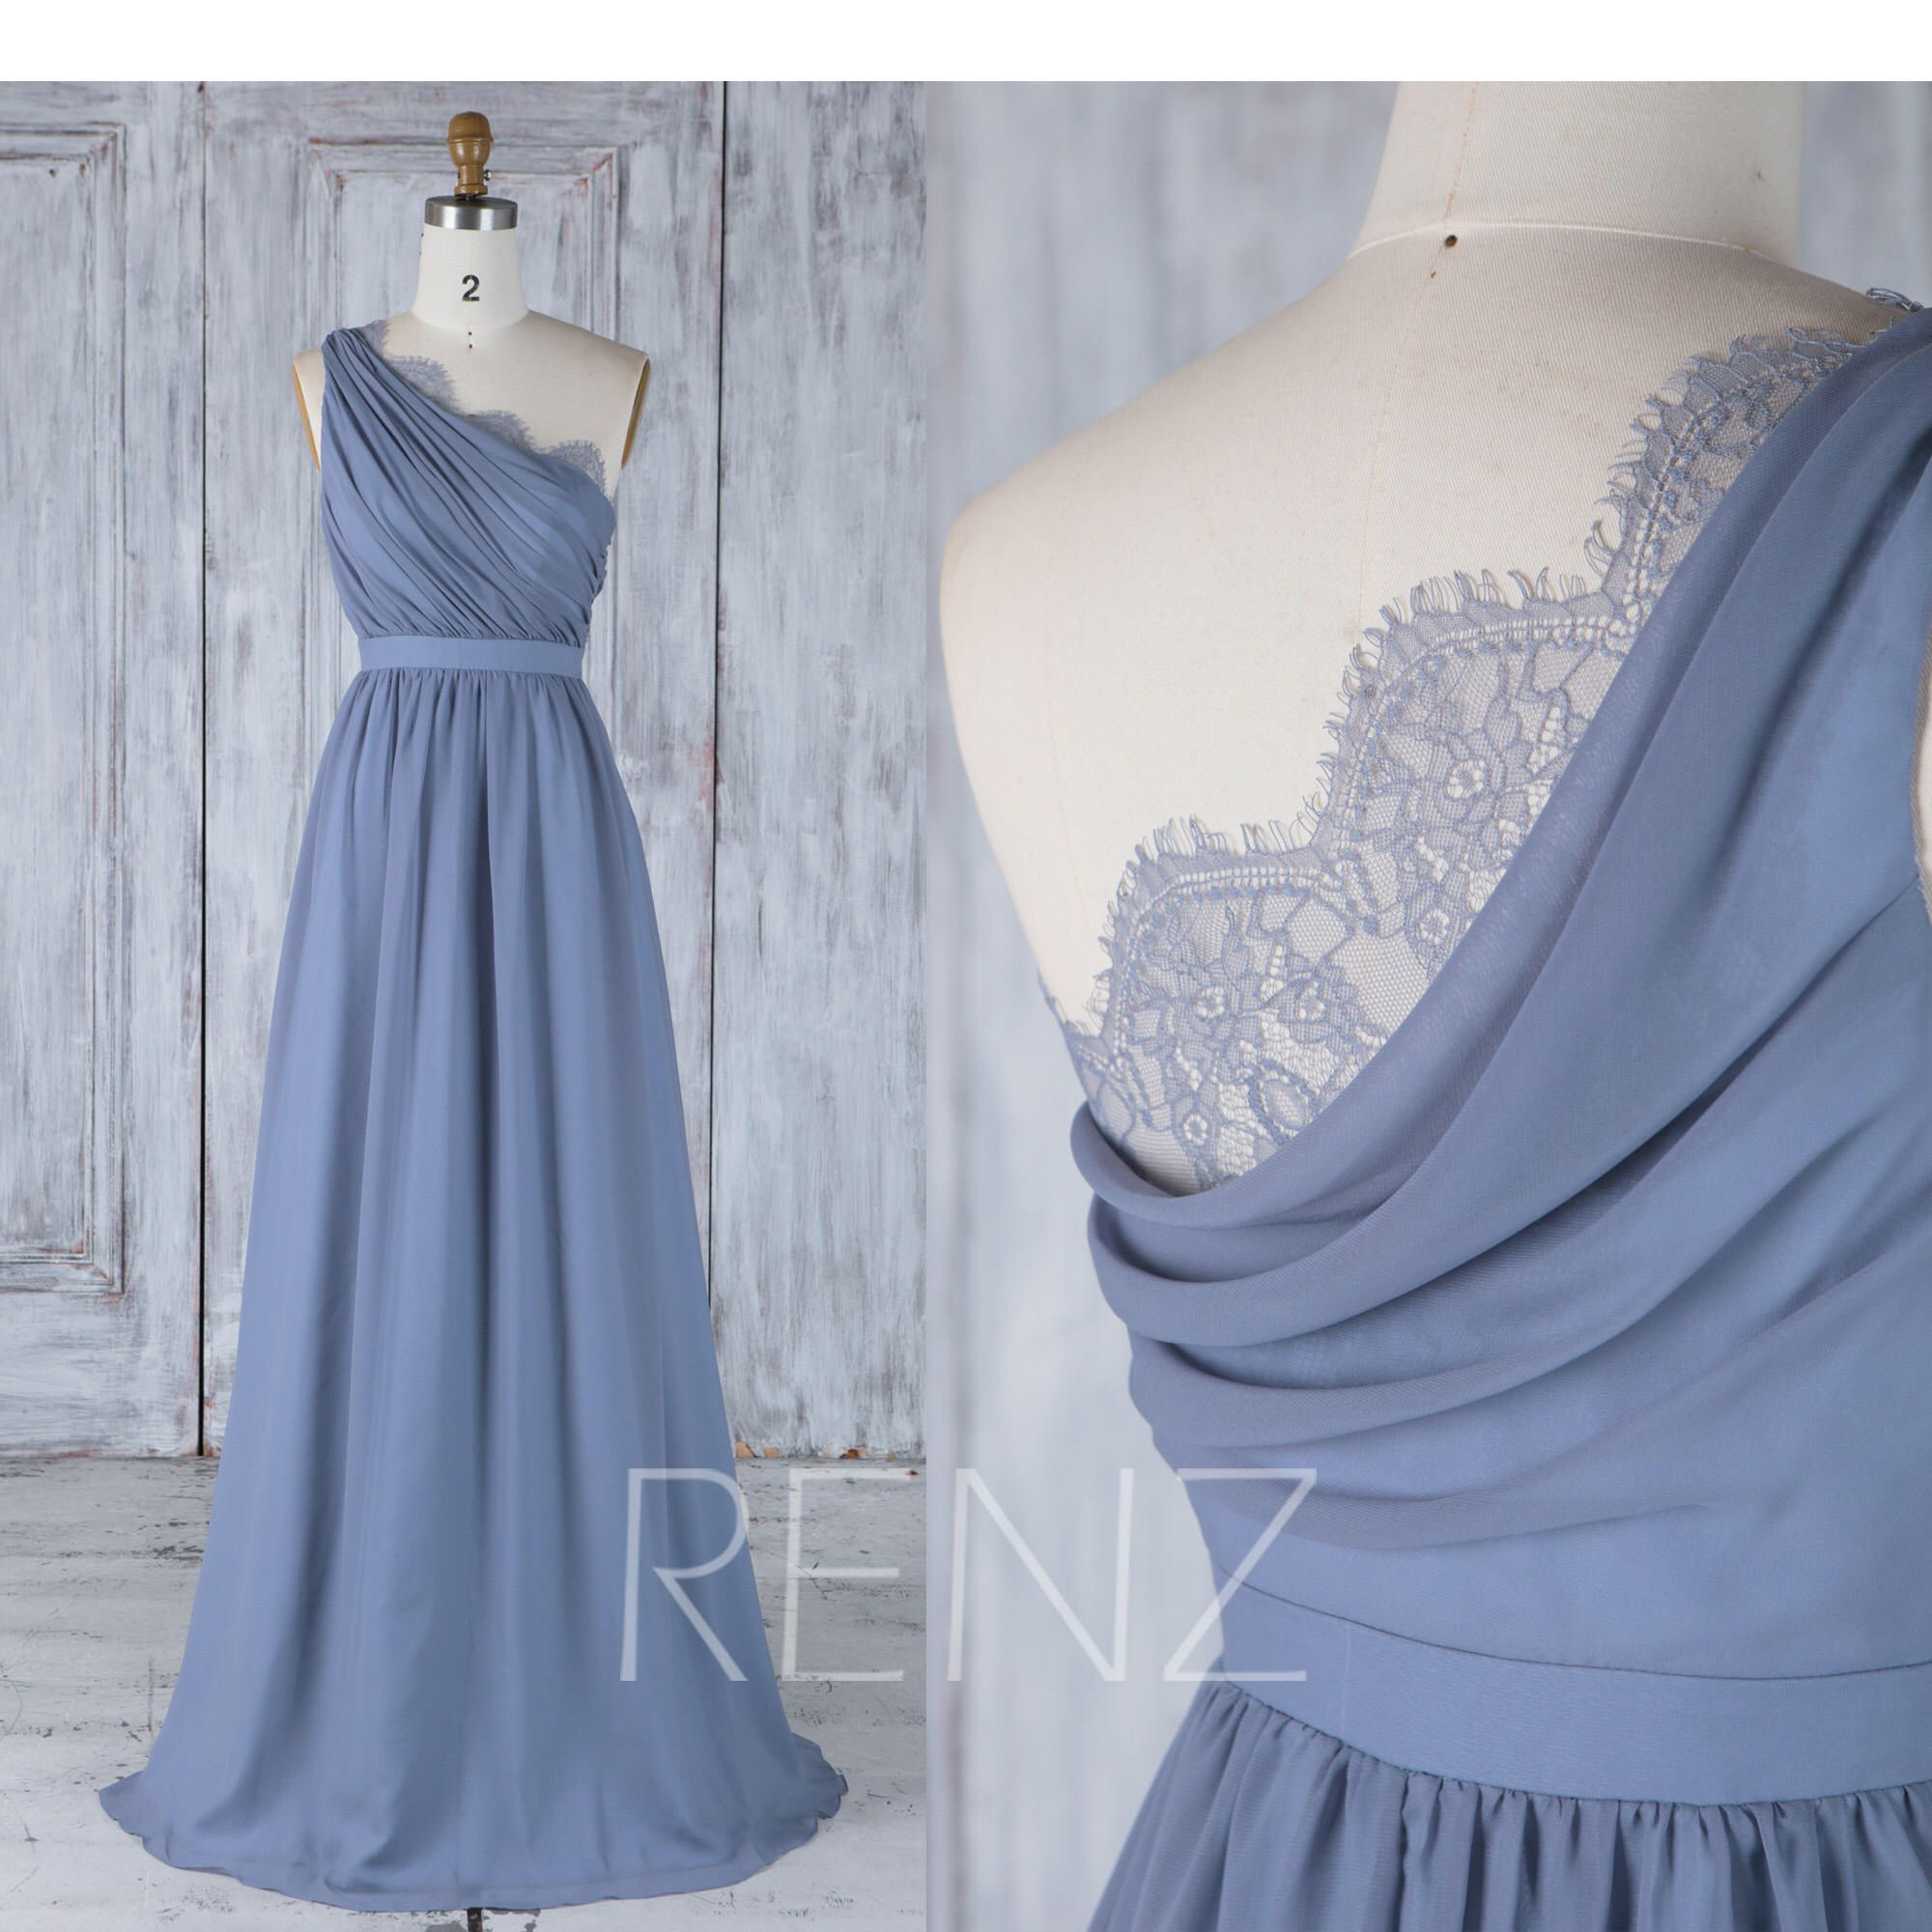 steel blue chiffon bridesmaid dress lace splice neck wedding